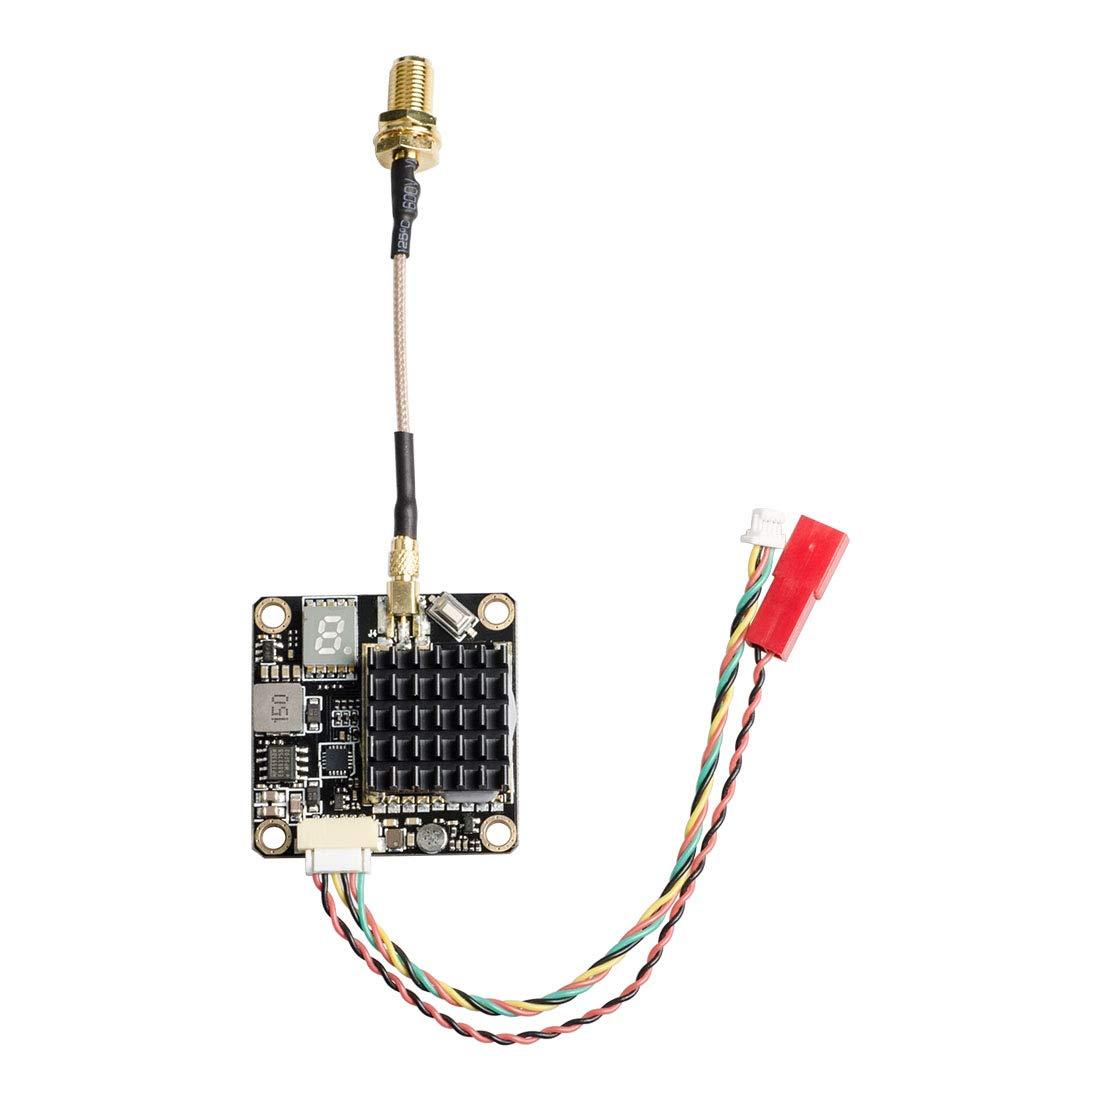 Wirelessan 5.8GHz 250mW/500mW/1000mW/2000mW Power Long Range Switchable FPV Transmitter with MMCX and FC Uart by Wirelessan (Image #3)